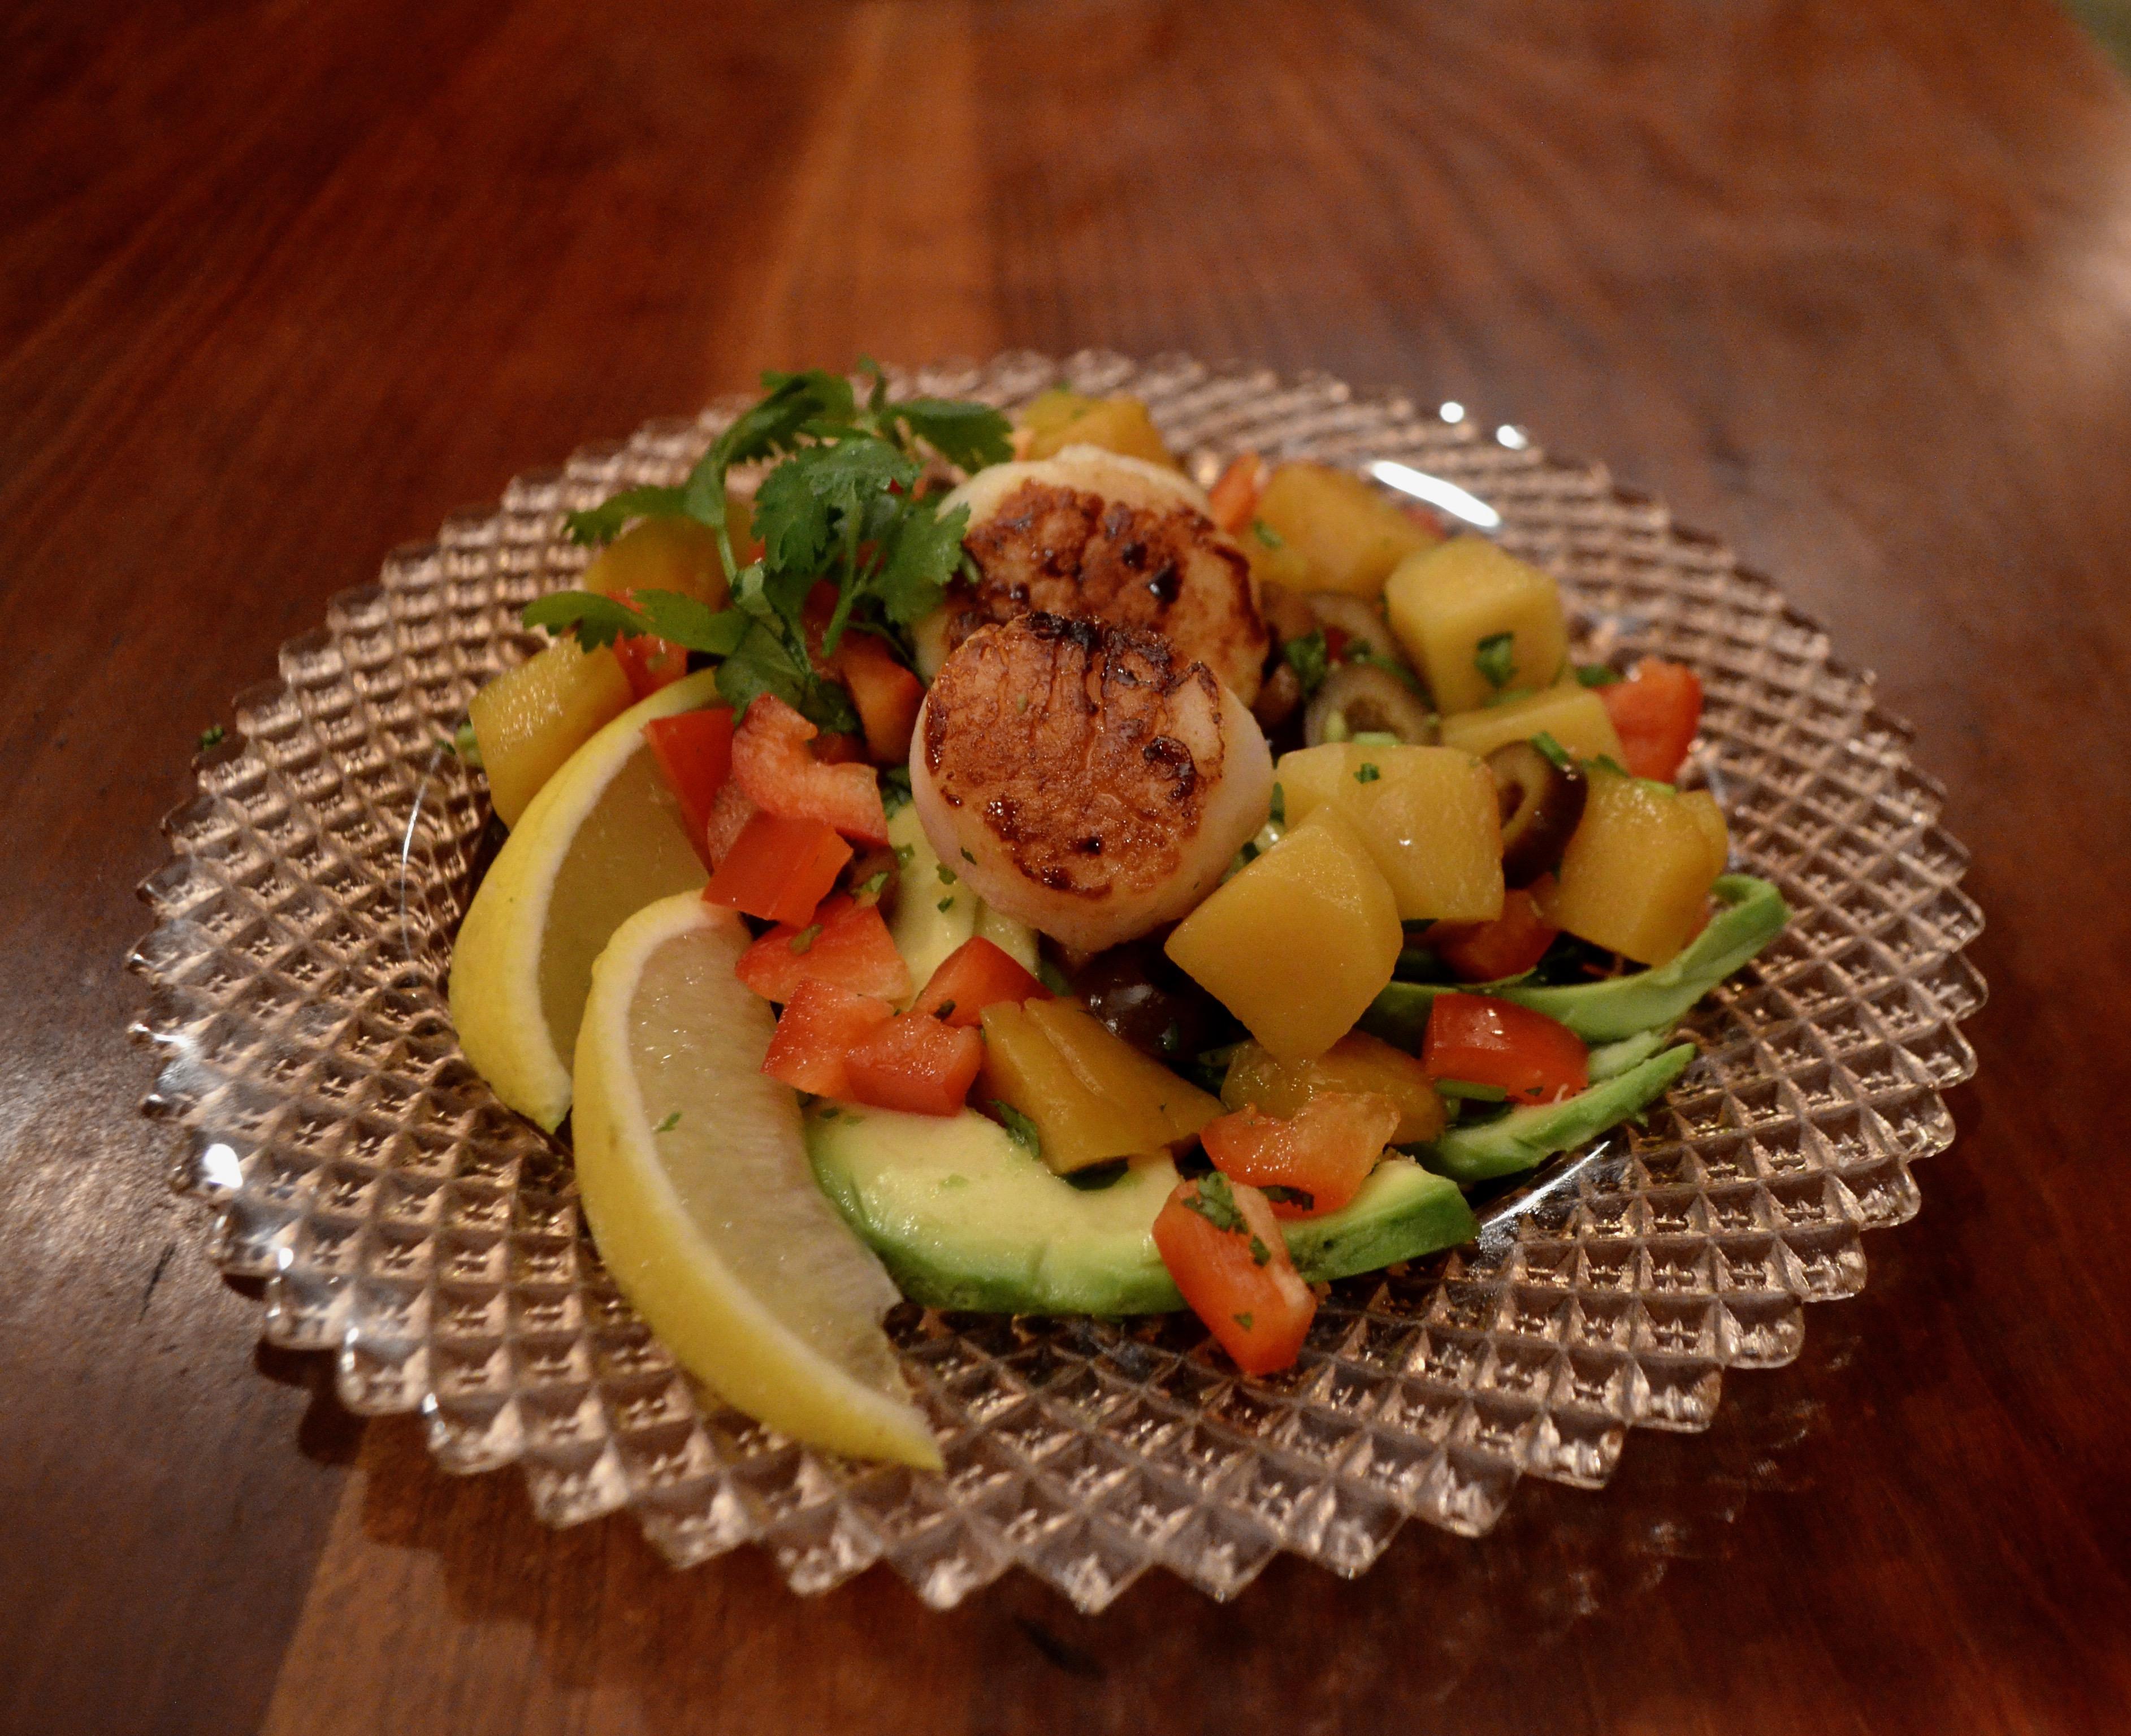 Avocado, Mango, and Scallop Salad